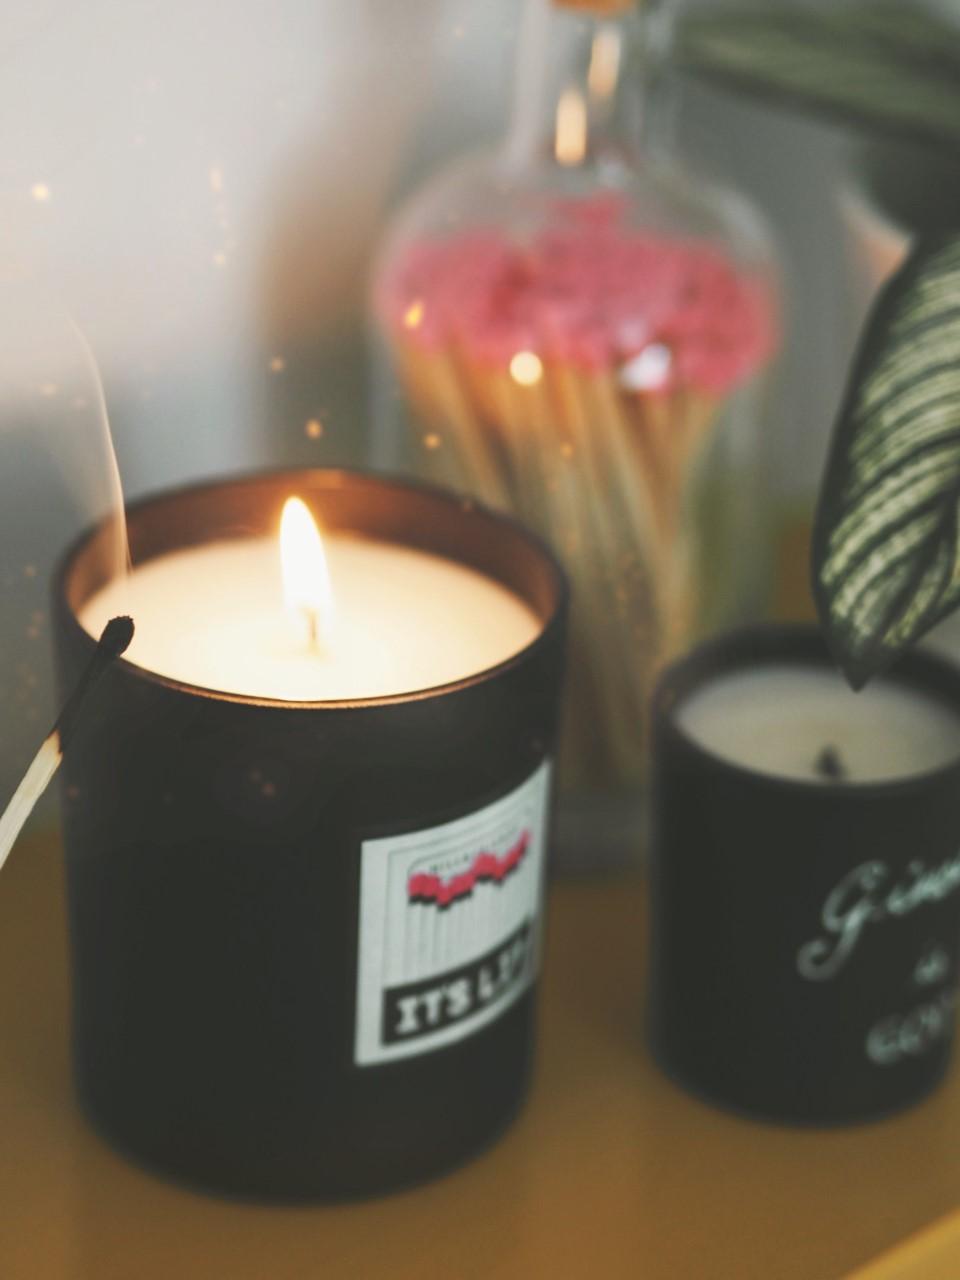 Hill & Friends 'It's Lit' Candle review bag